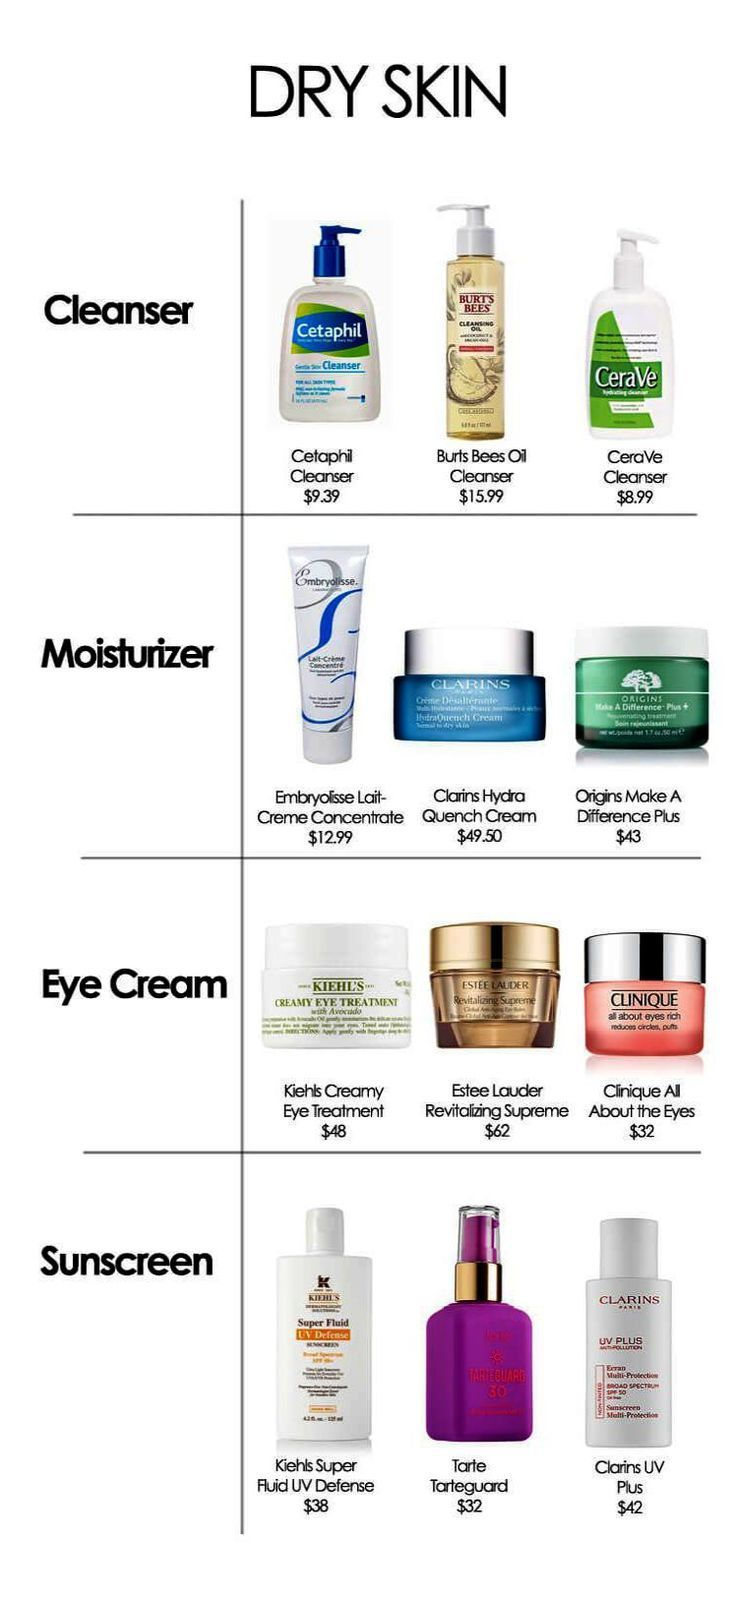 Skincare Routine For Dry Skin Skincare Brands For Dry Skin During Men 39 S Skinc Skin Cleanser Products Dry Skin Cleansers Acne Skincare Routine